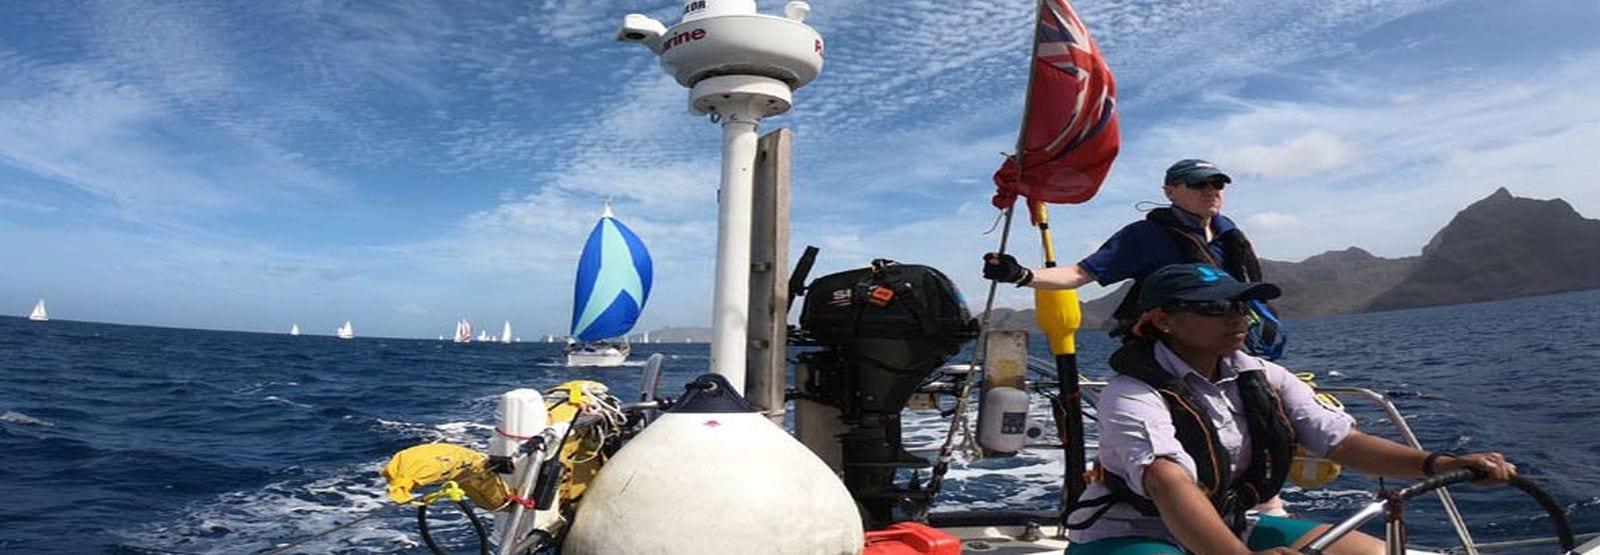 Sail Leg 2 of World ARC